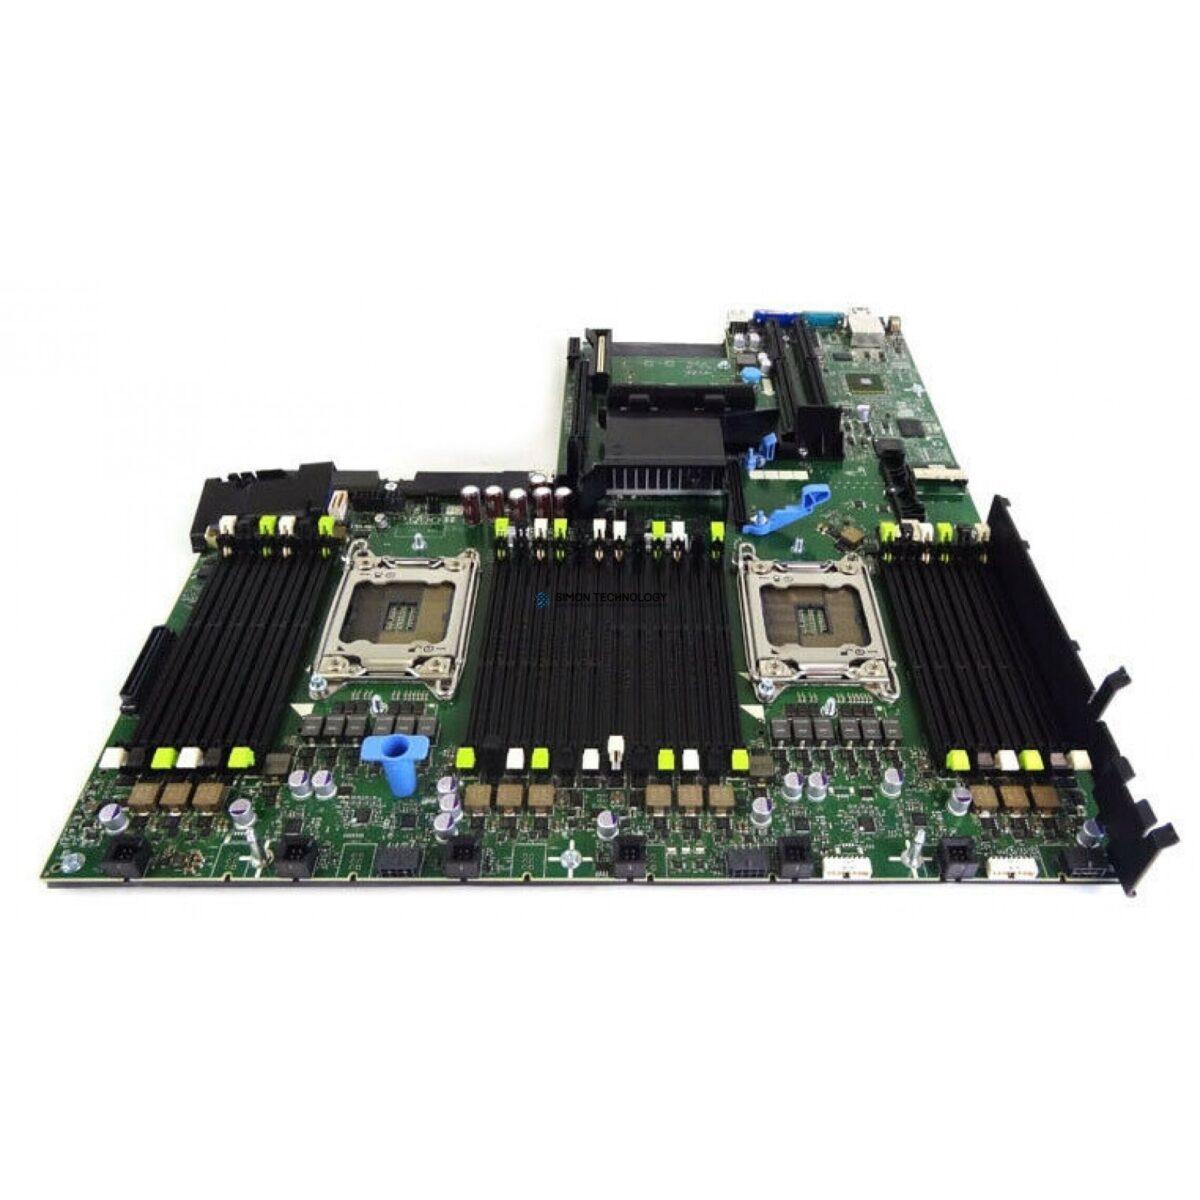 Dell DELL PER720XD V5 SYSTEM BOARD (0H5J4J)